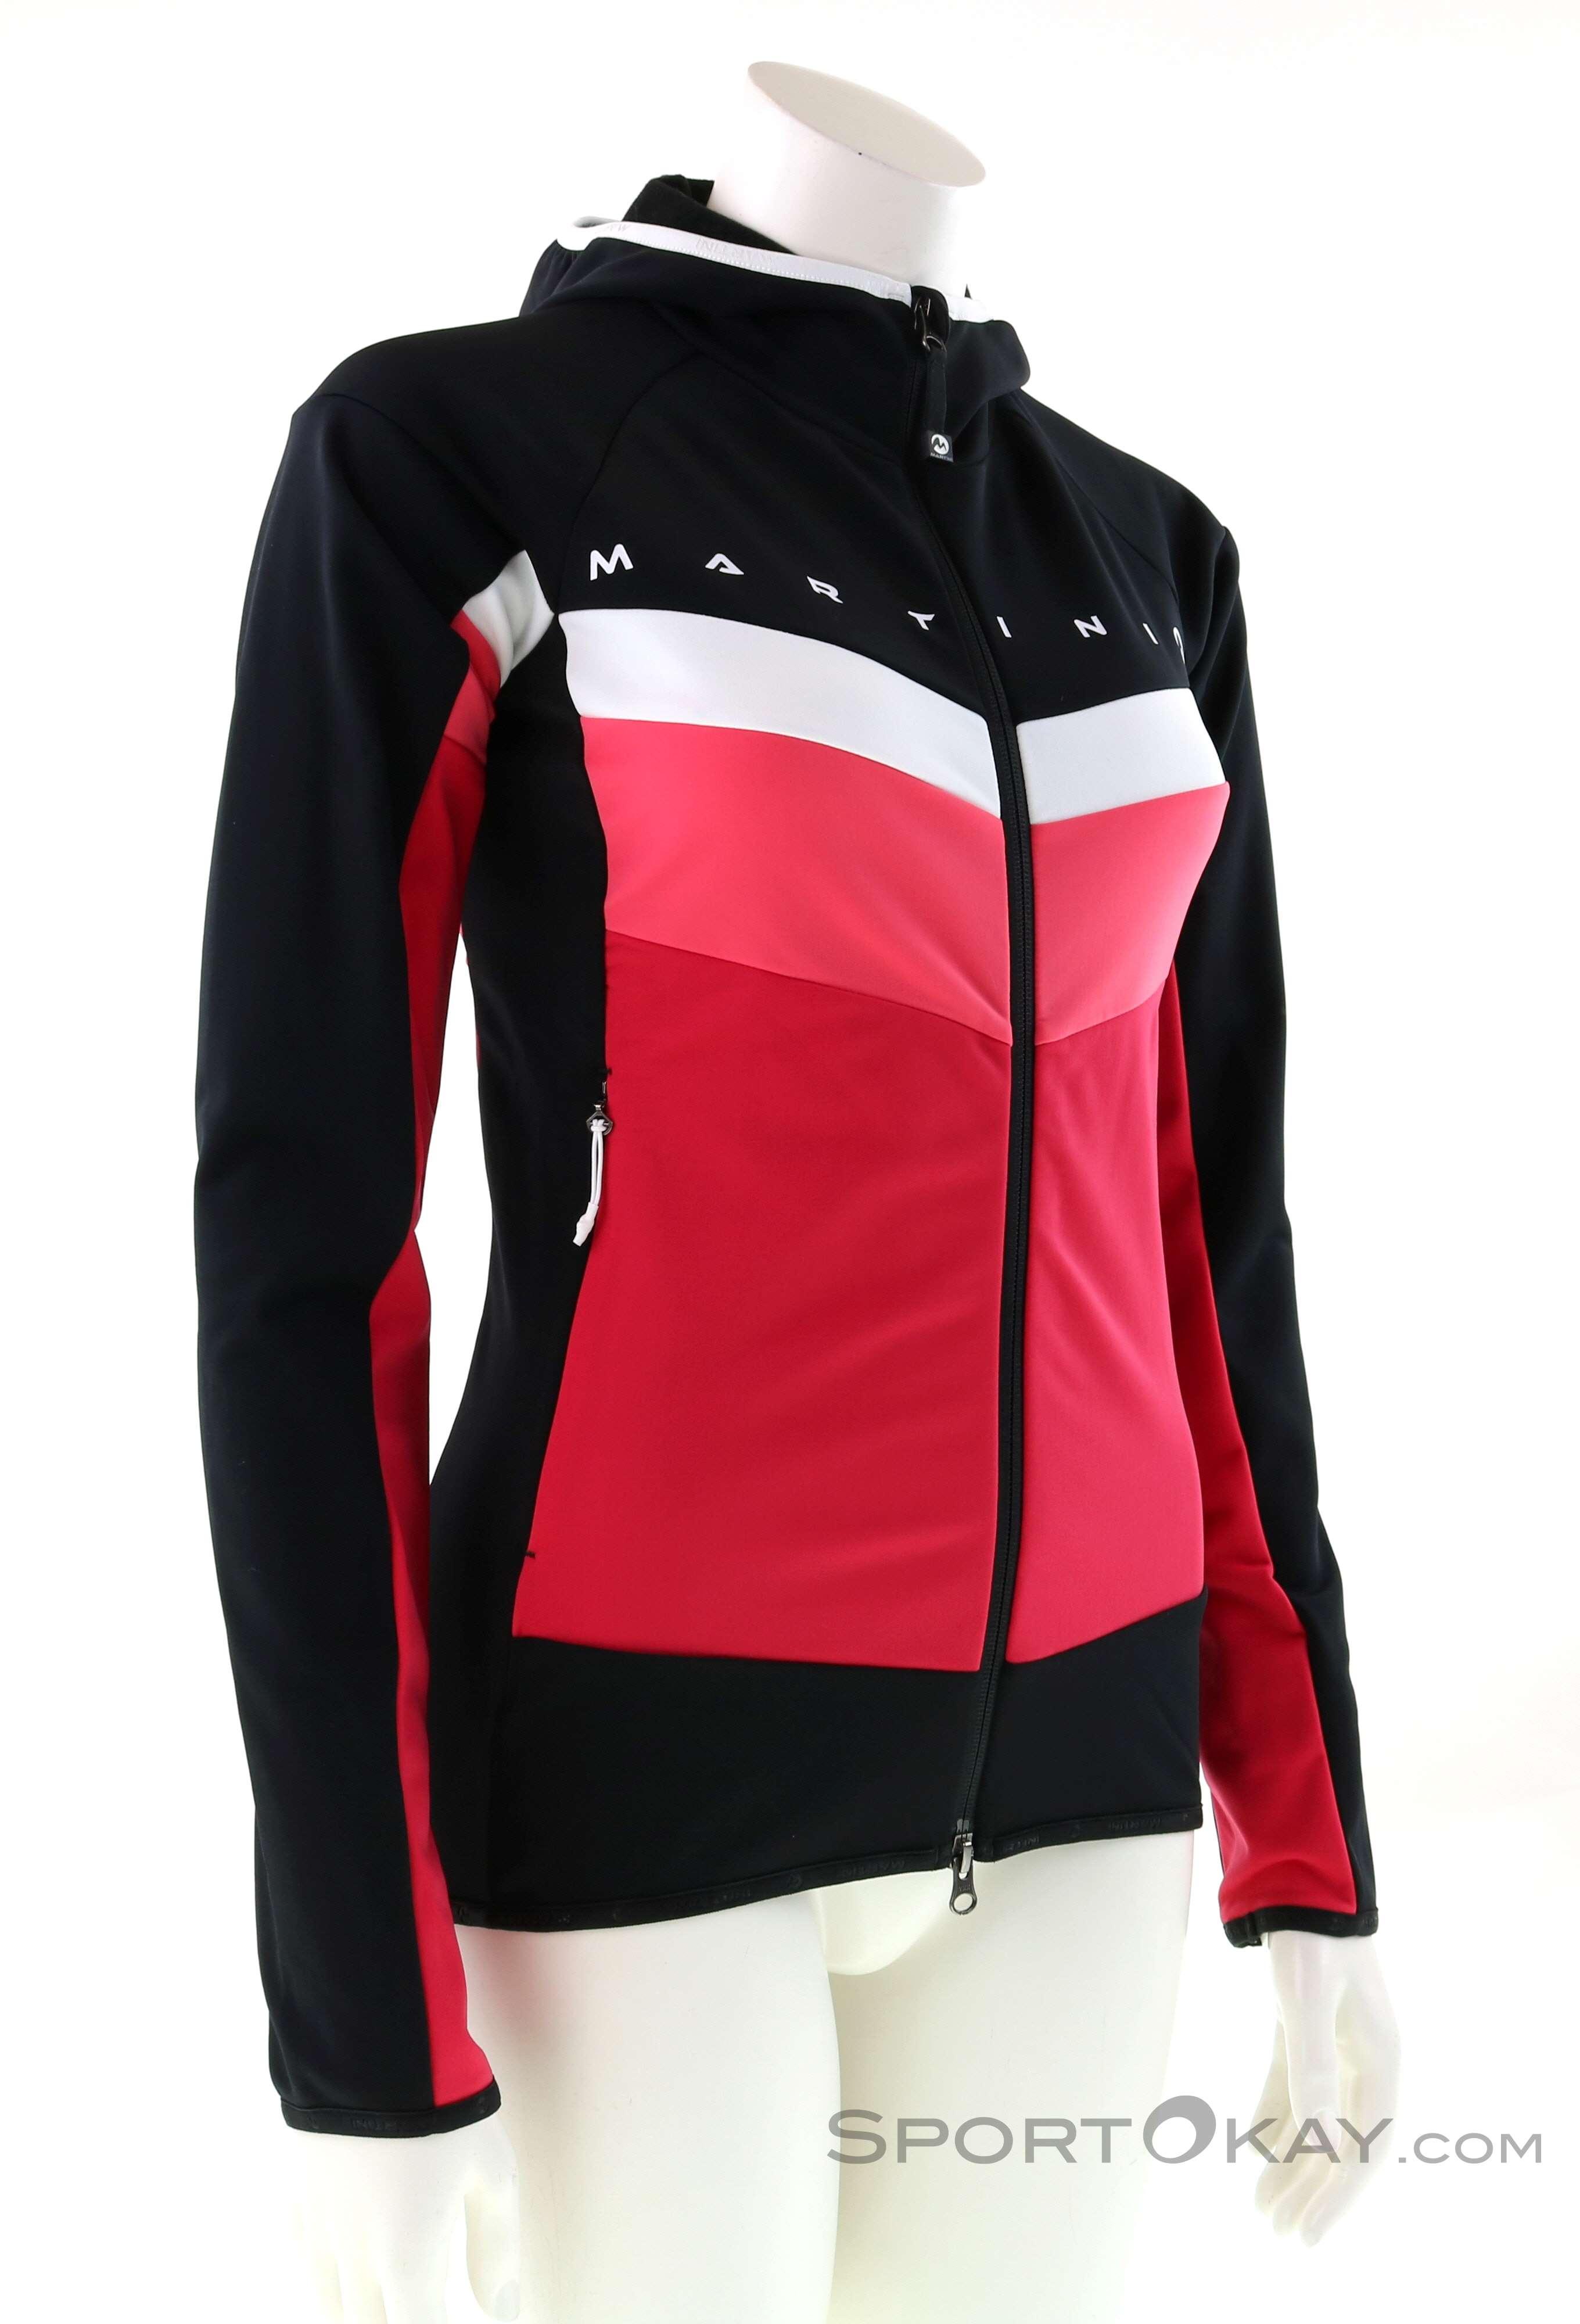 Jacket Independent Ski Touring Womens Martini 80yvNOmwn